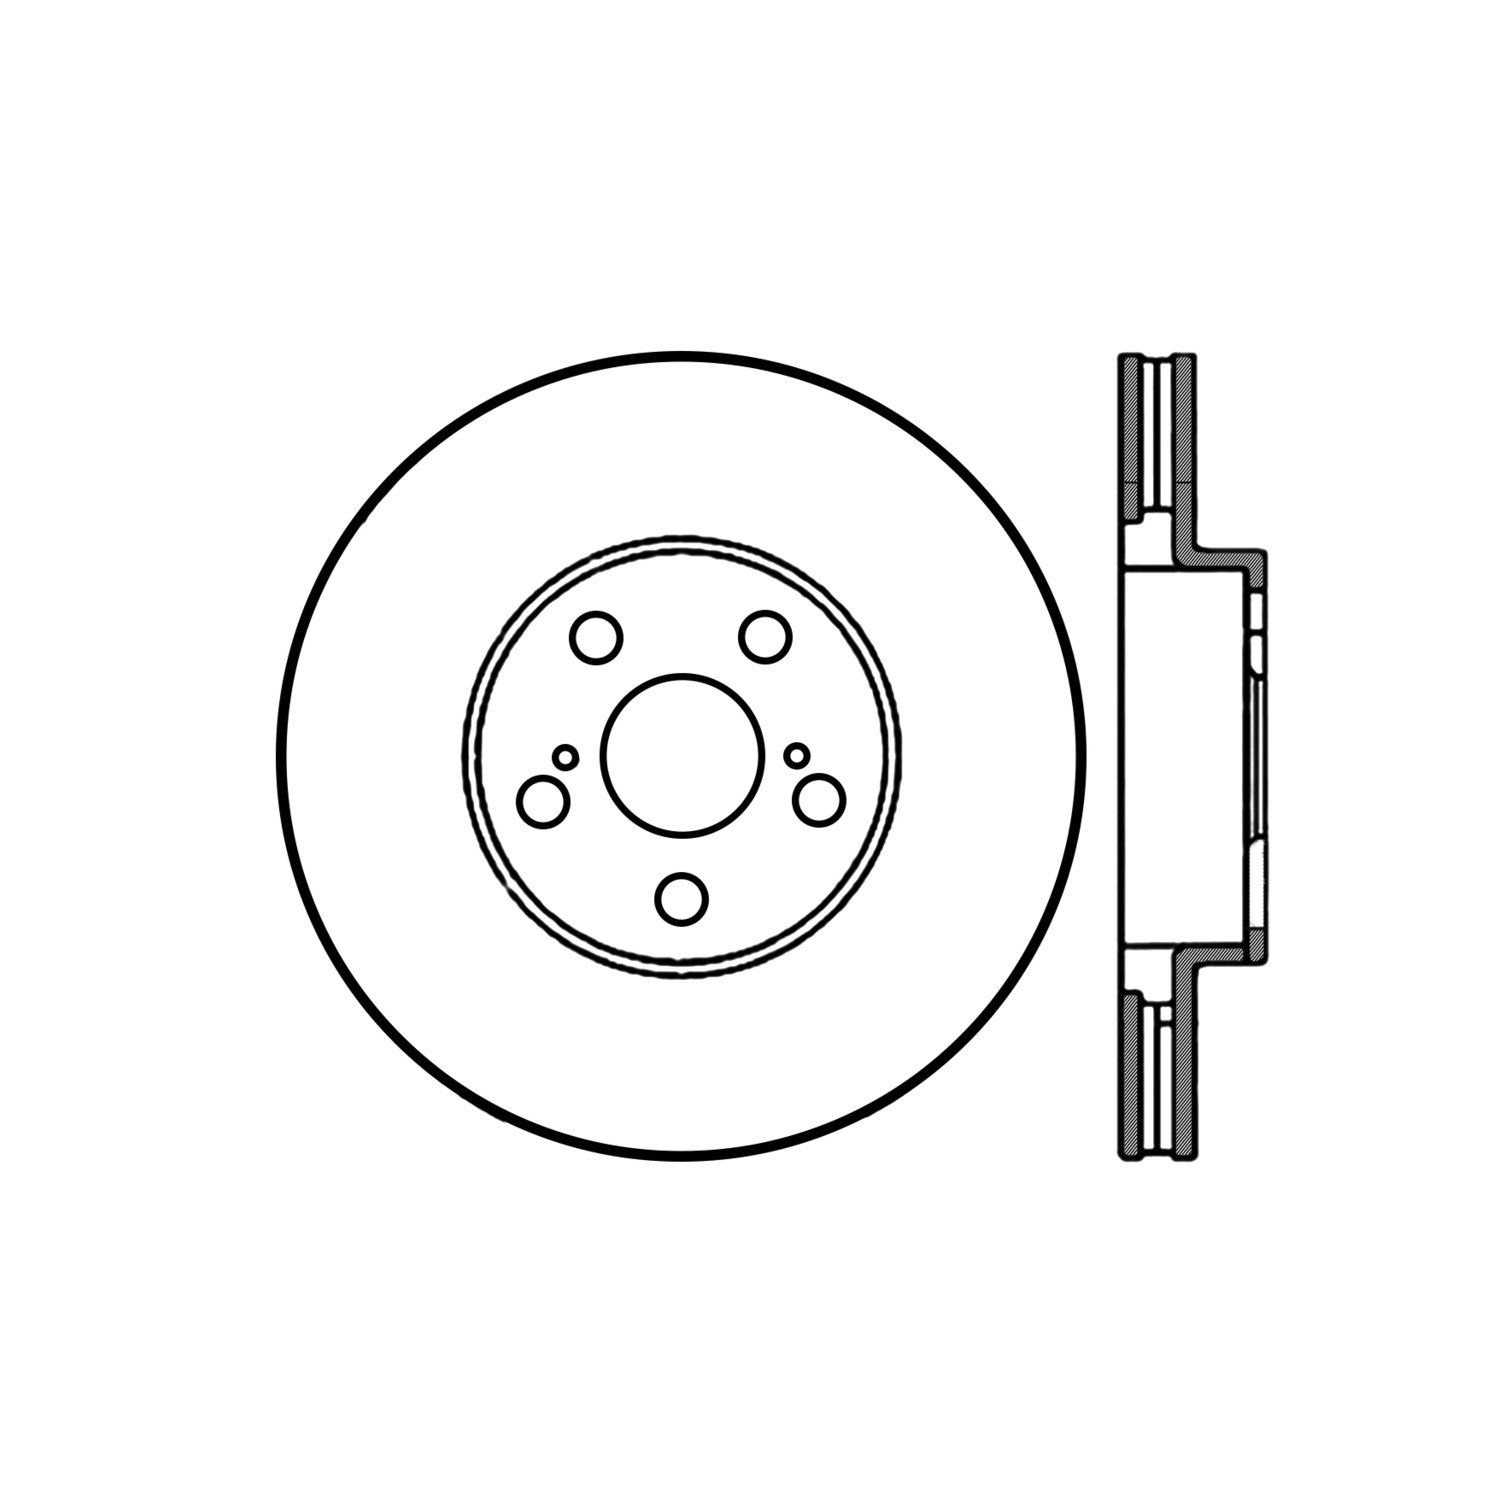 2007 Pontiac Vibe Disc Brake Rotor Wave Wiring Diagram Ce 12044114